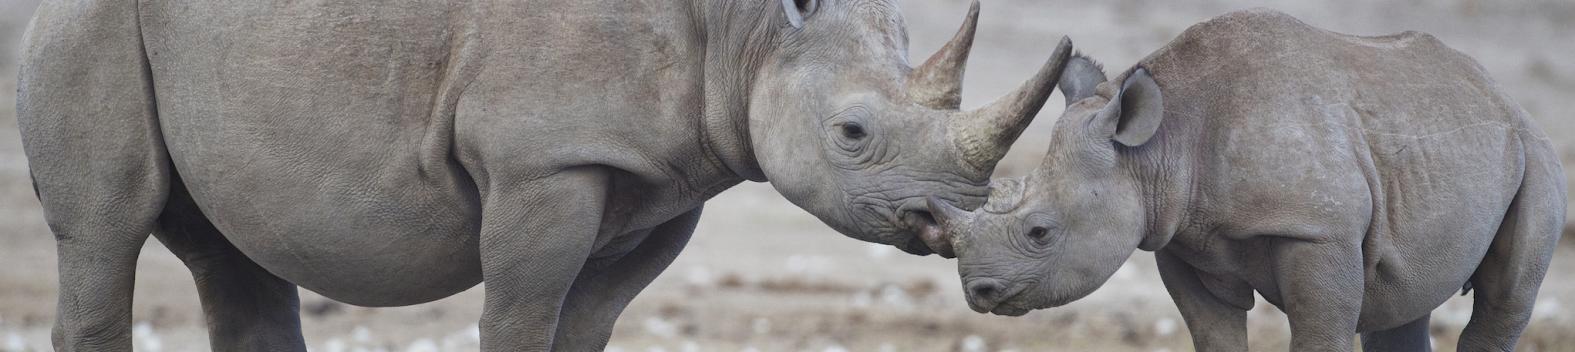 slider-rhinos_0.jpg